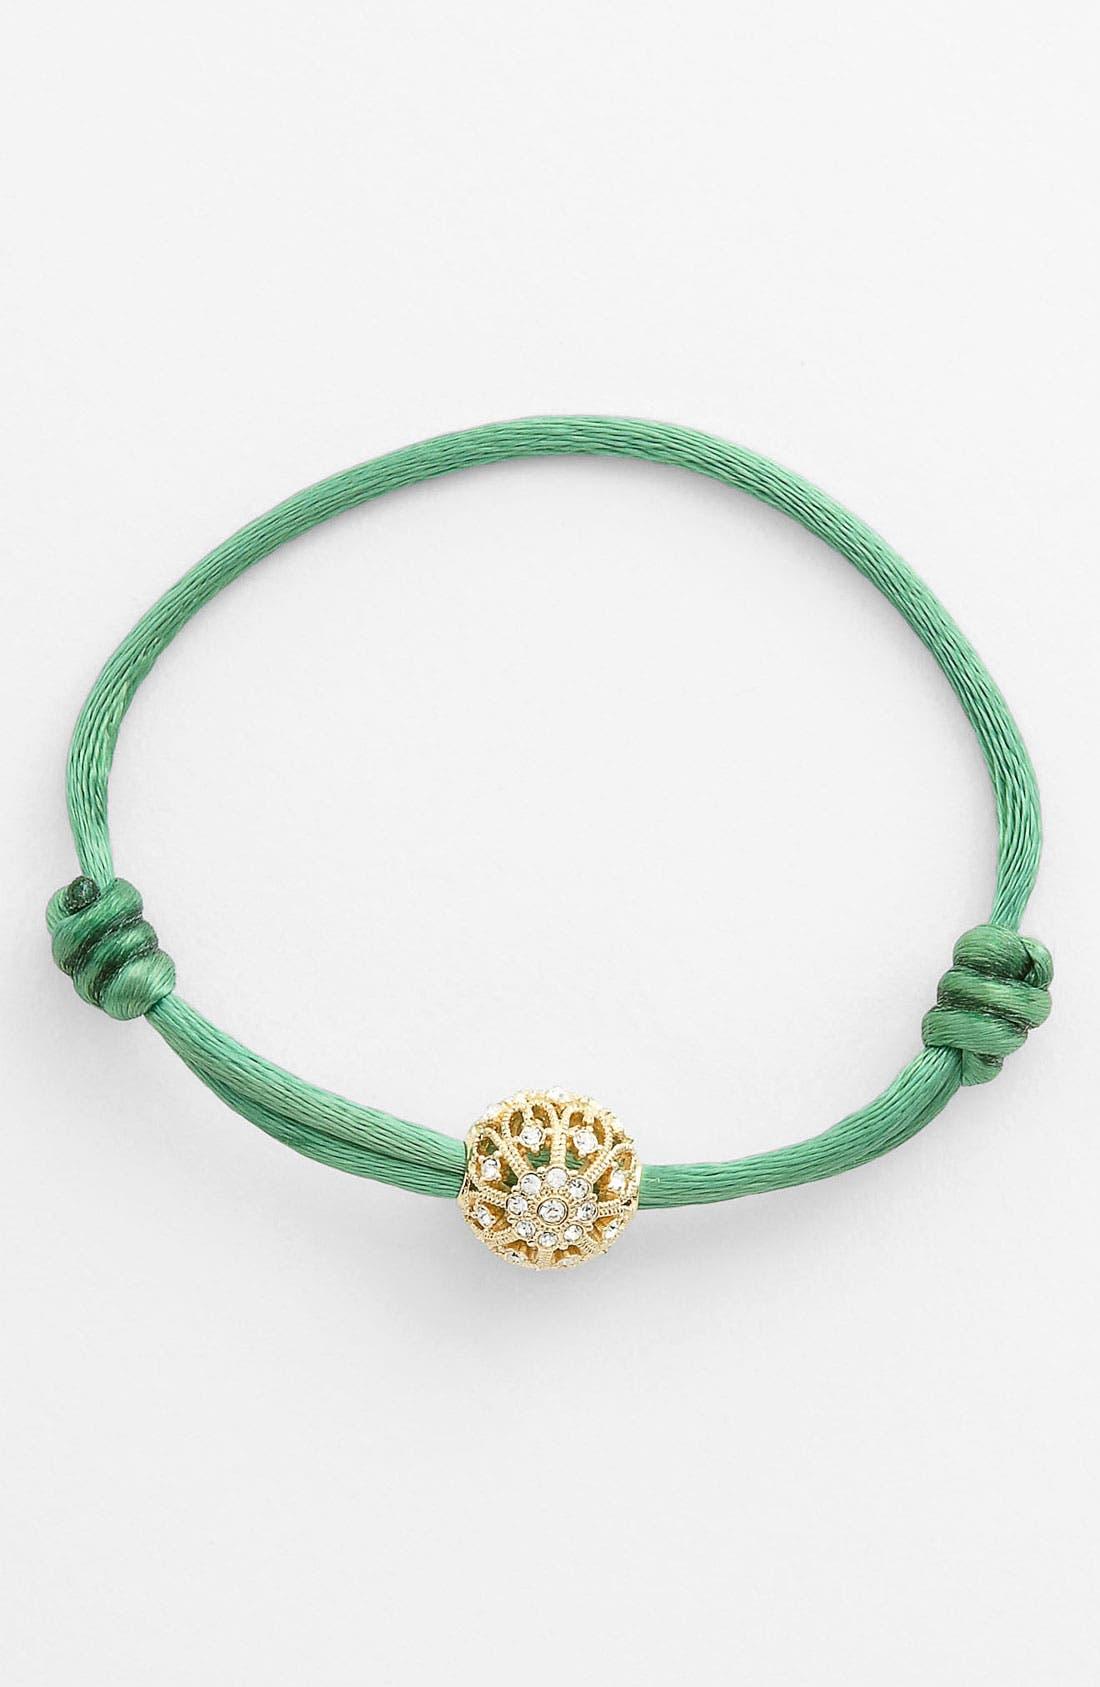 Alternate Image 1 Selected - Nadri Cord Charm Bracelet (Nordstrom Exclusive)